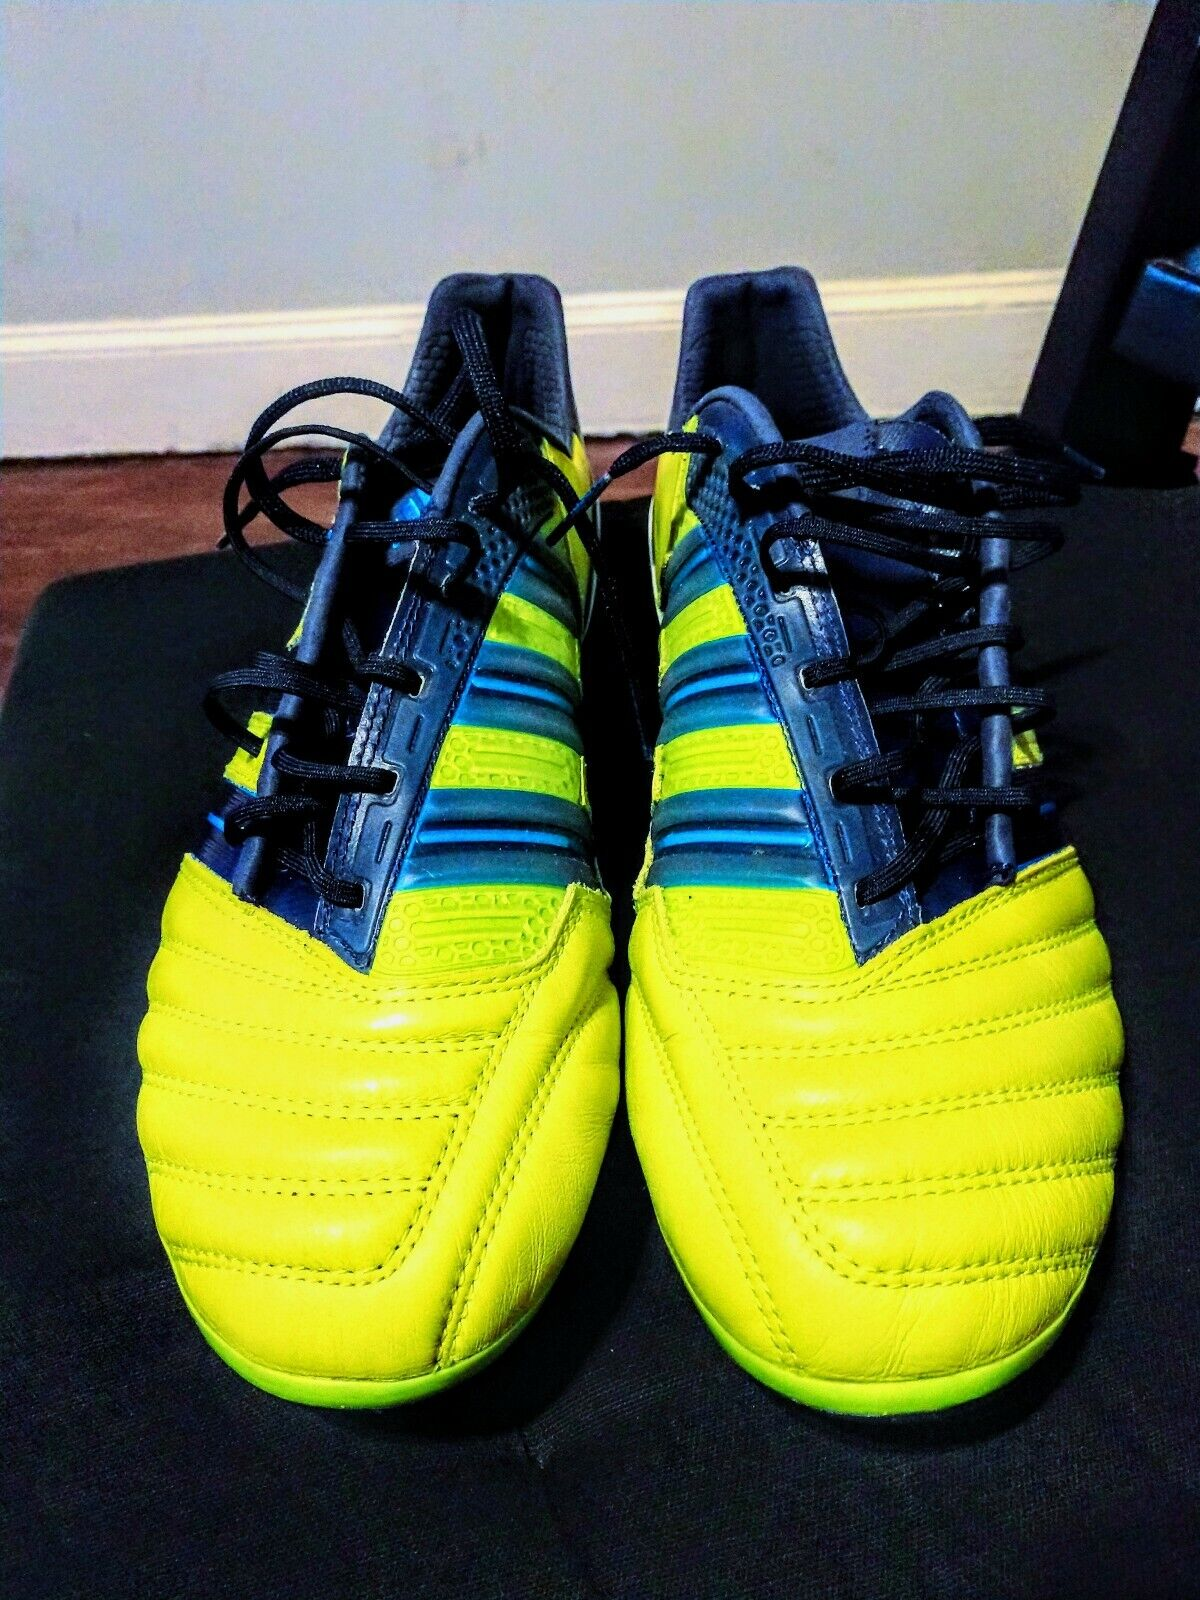 Adidas Adipower Projoator Cuero botas De Fútbol Soccer Cleats van Persie RVP